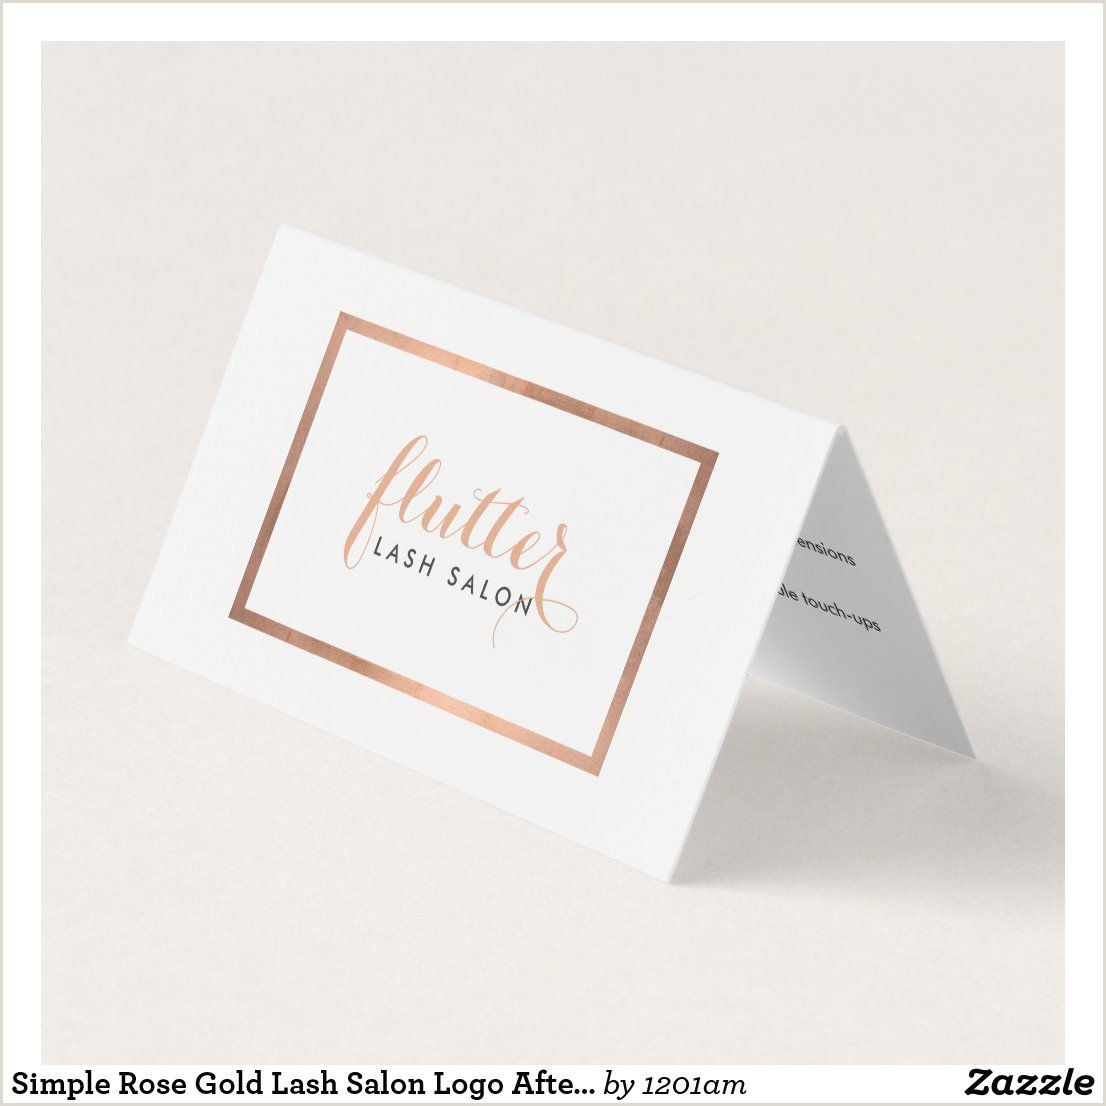 Unique Rose Gold Business Cards Simple Rose Gold Lash Salon Logo Aftercare Card